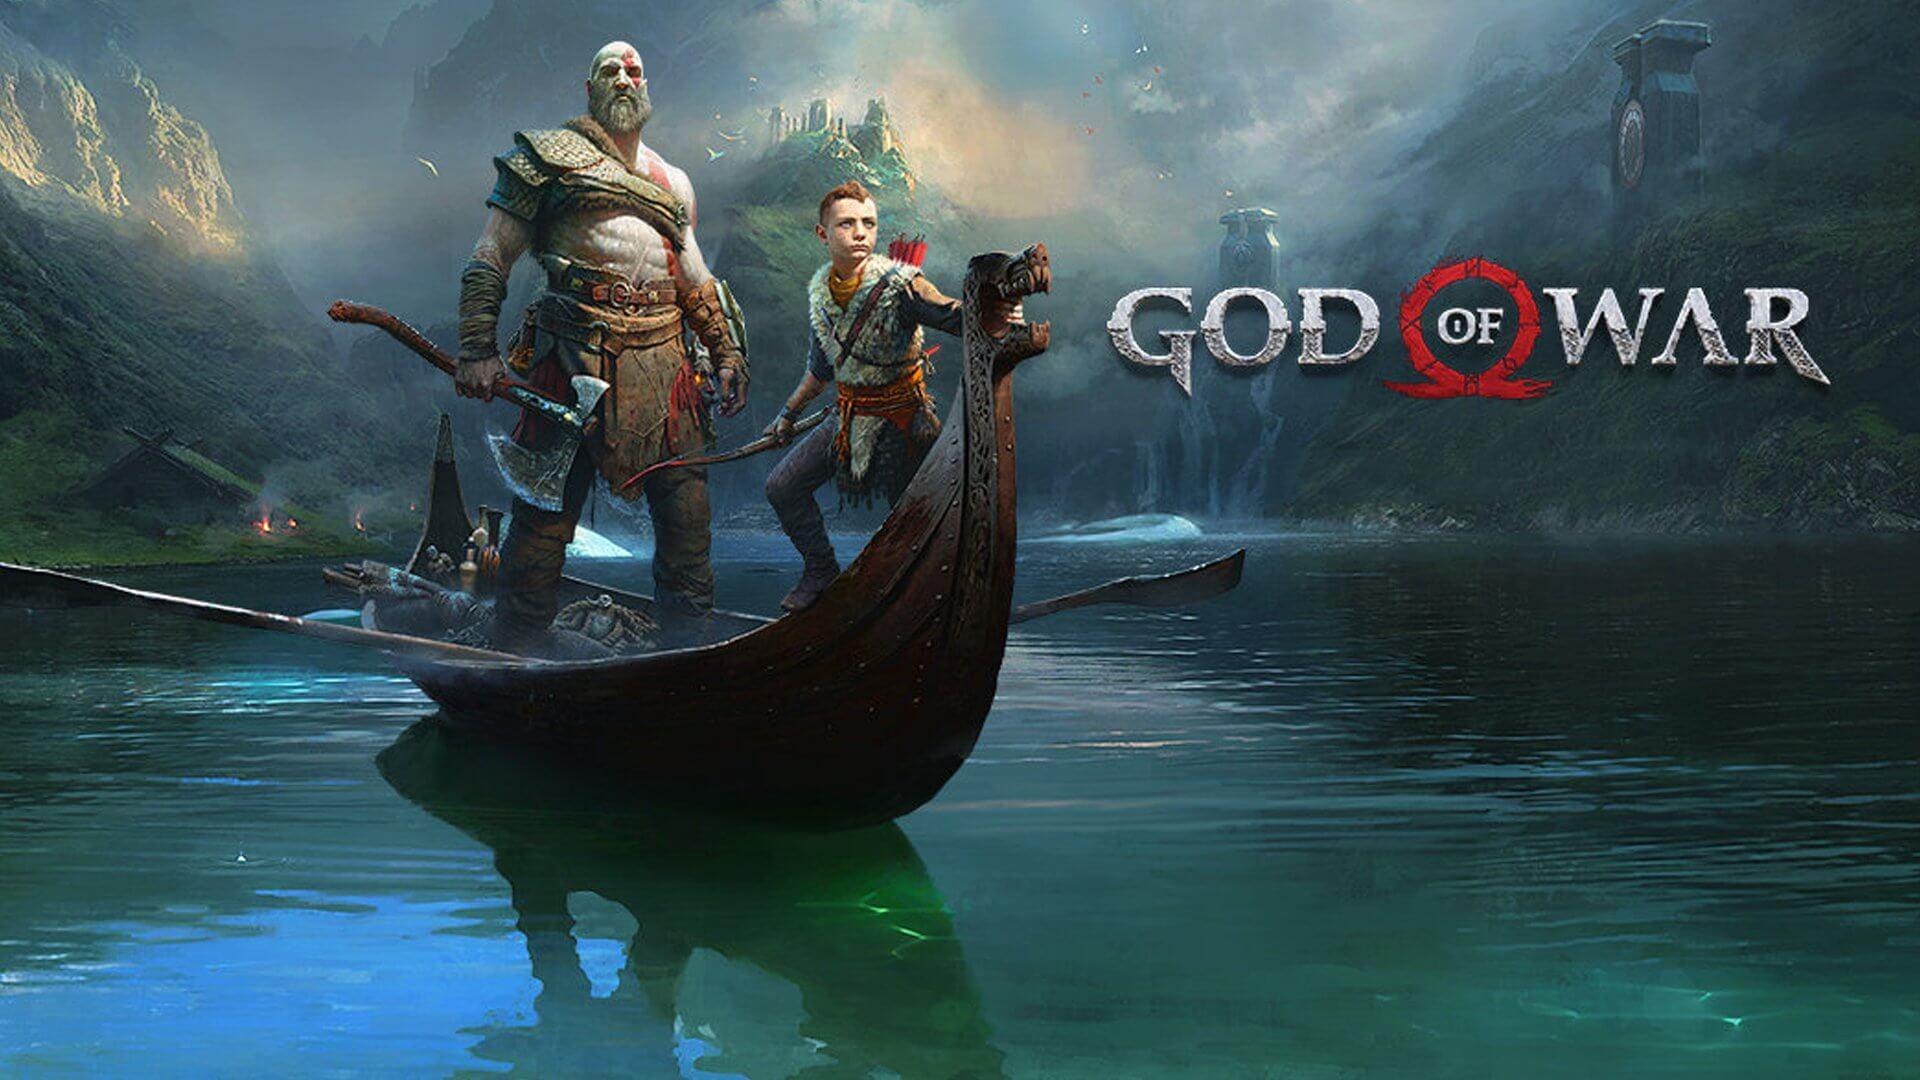 God of War 4 1 - Review: God of War (PS4) renova com louvor a franquia da Sony